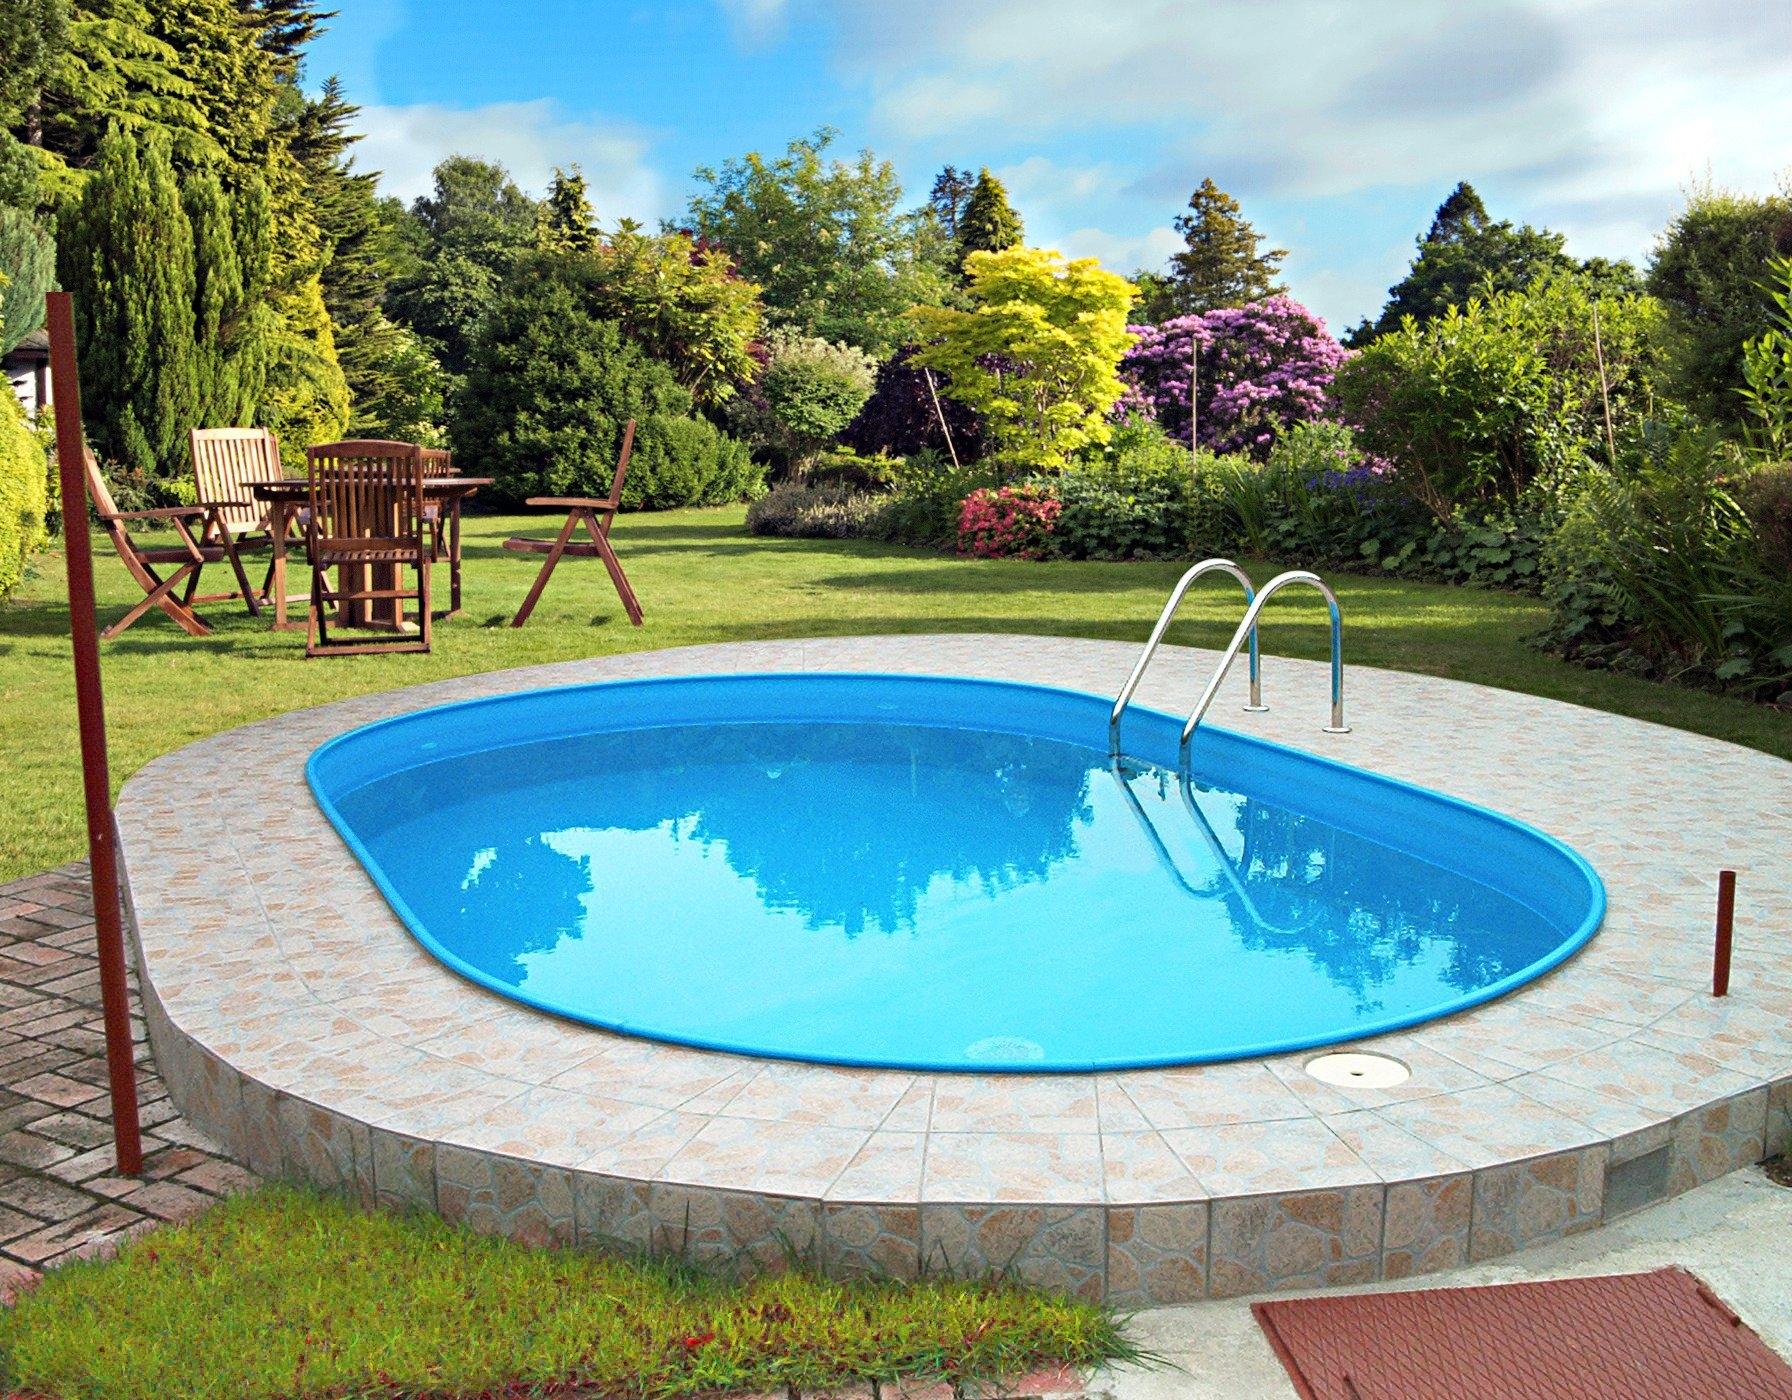 14f257e8e4027e ... Solardouche »Solardouche SilverDeLuxe«, 226 cm, zilverkleur, CLEAR POOL  set: Achtvormig zwembad »8-vormig zwembad«, 2-dlg., Overkapping »Cabrio  Dome«